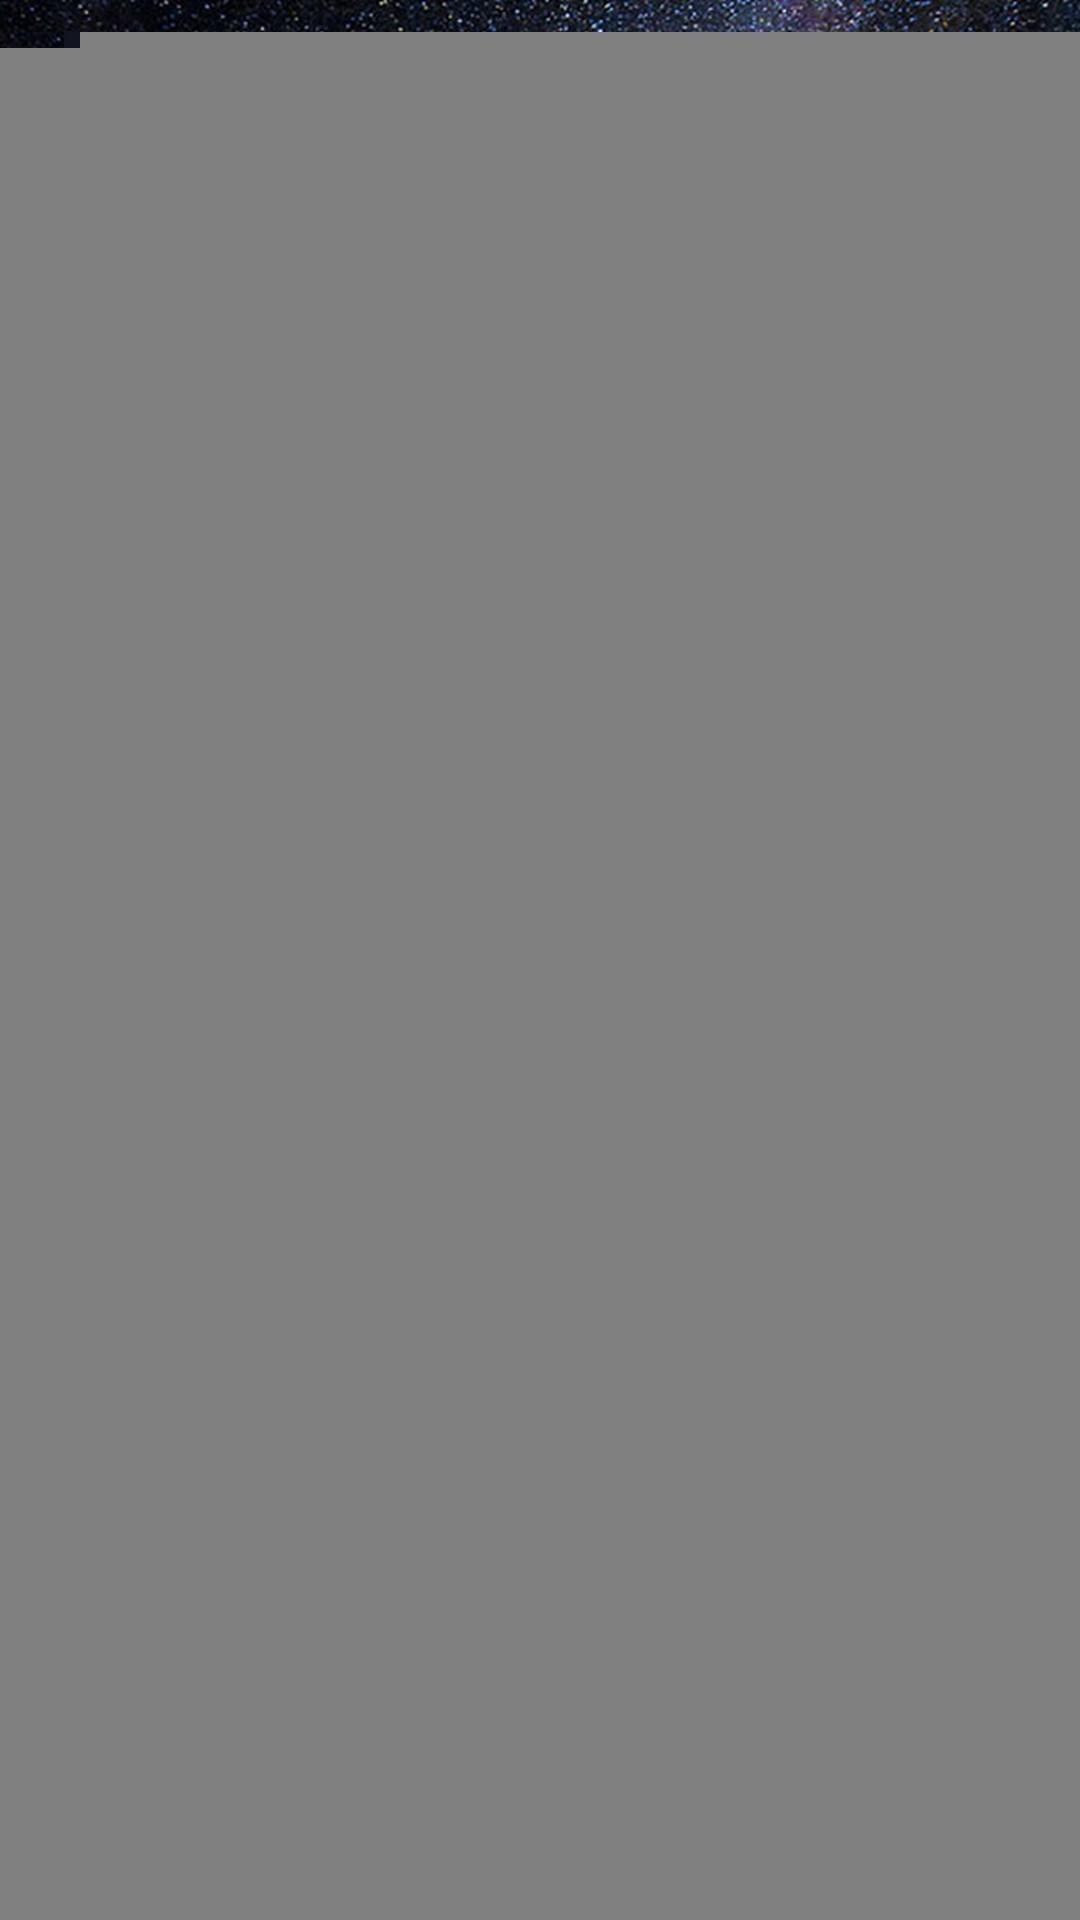 … e iphone 7 wallpapers free iphone 7 wallpapers iphone 7 …